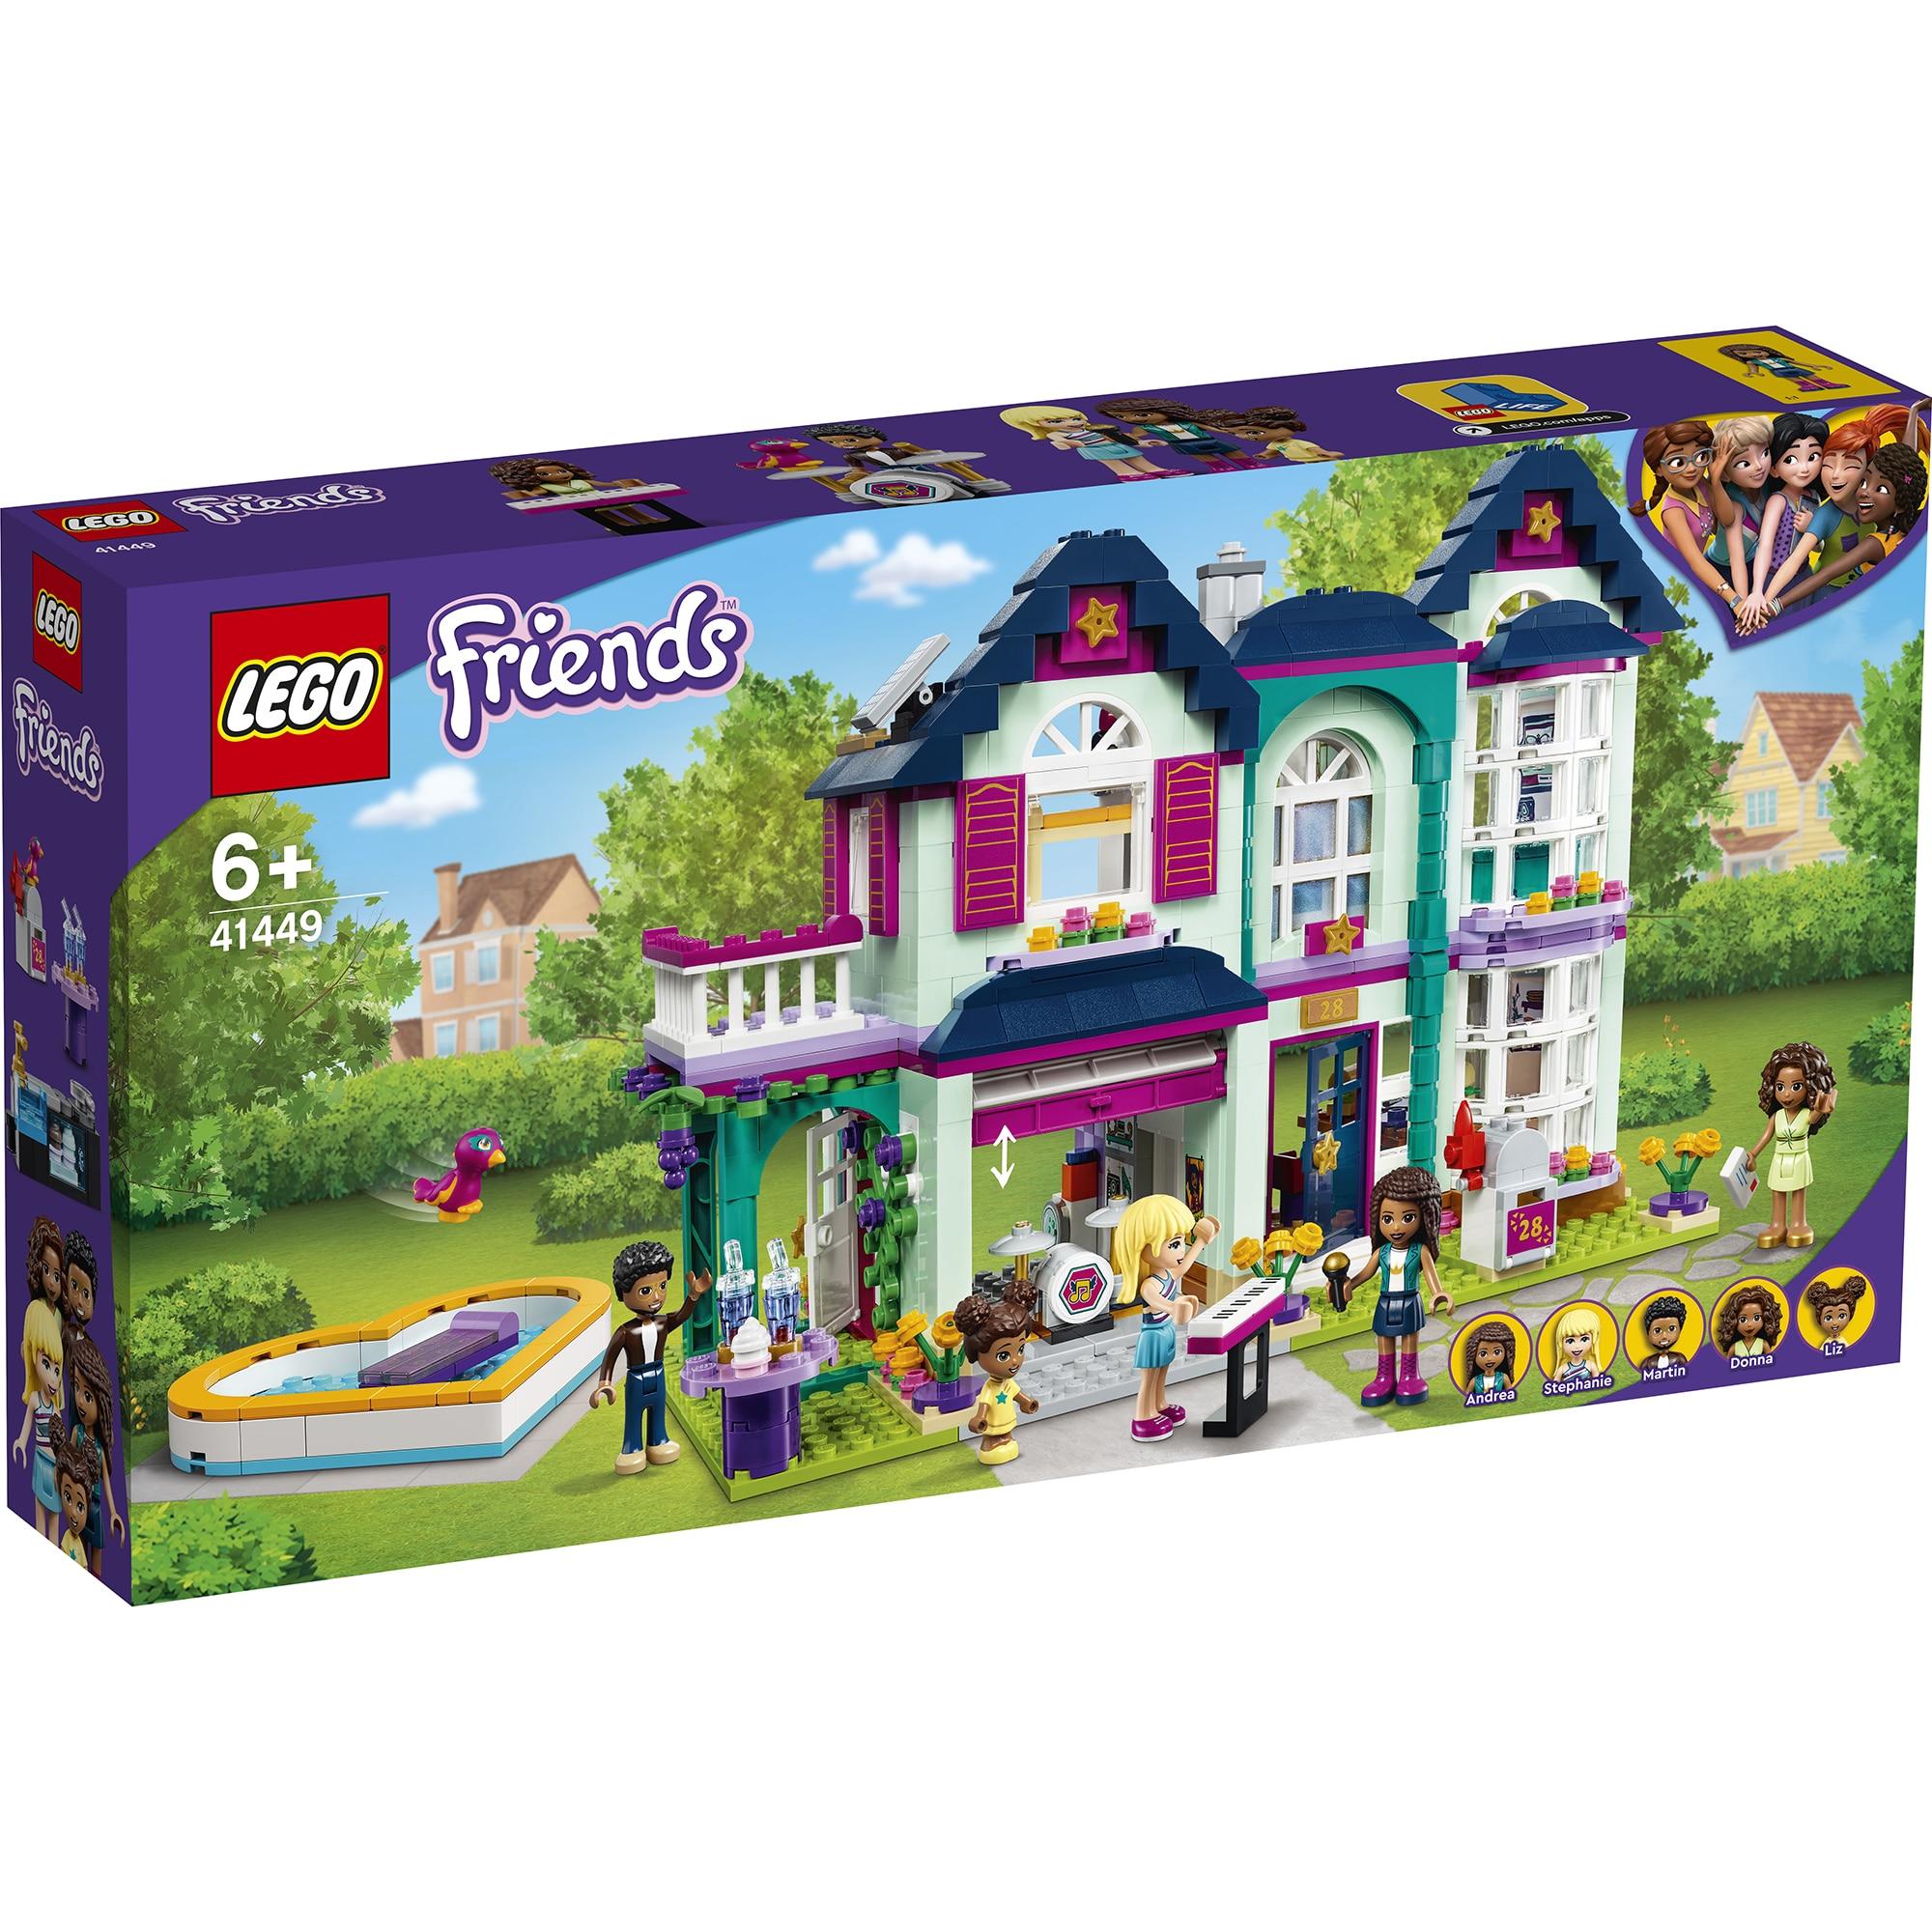 Fotografie LEGO Friends - Casa familiei Andreei 41449, 802 piese